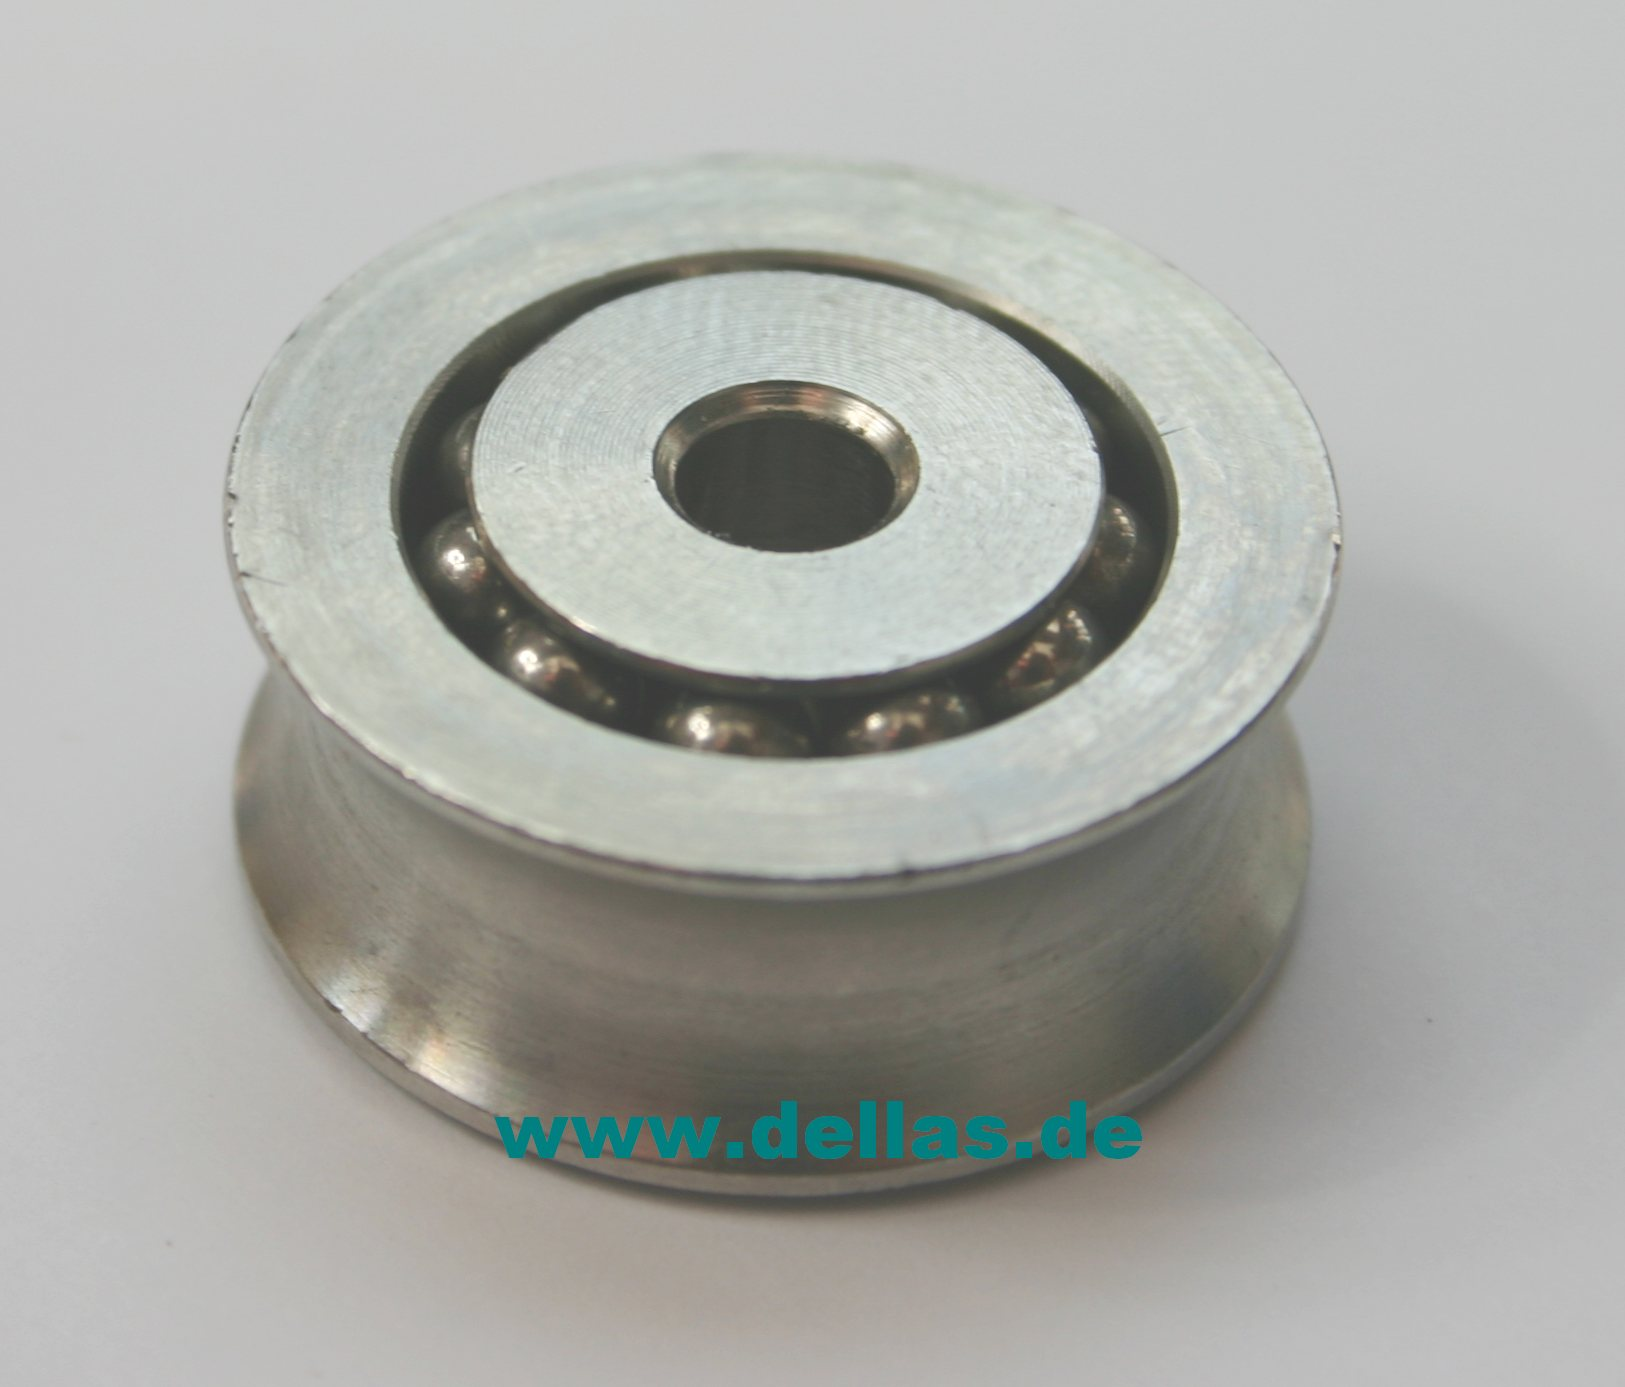 Seilrolle 27 x 10,5 mm-S30940 008 55